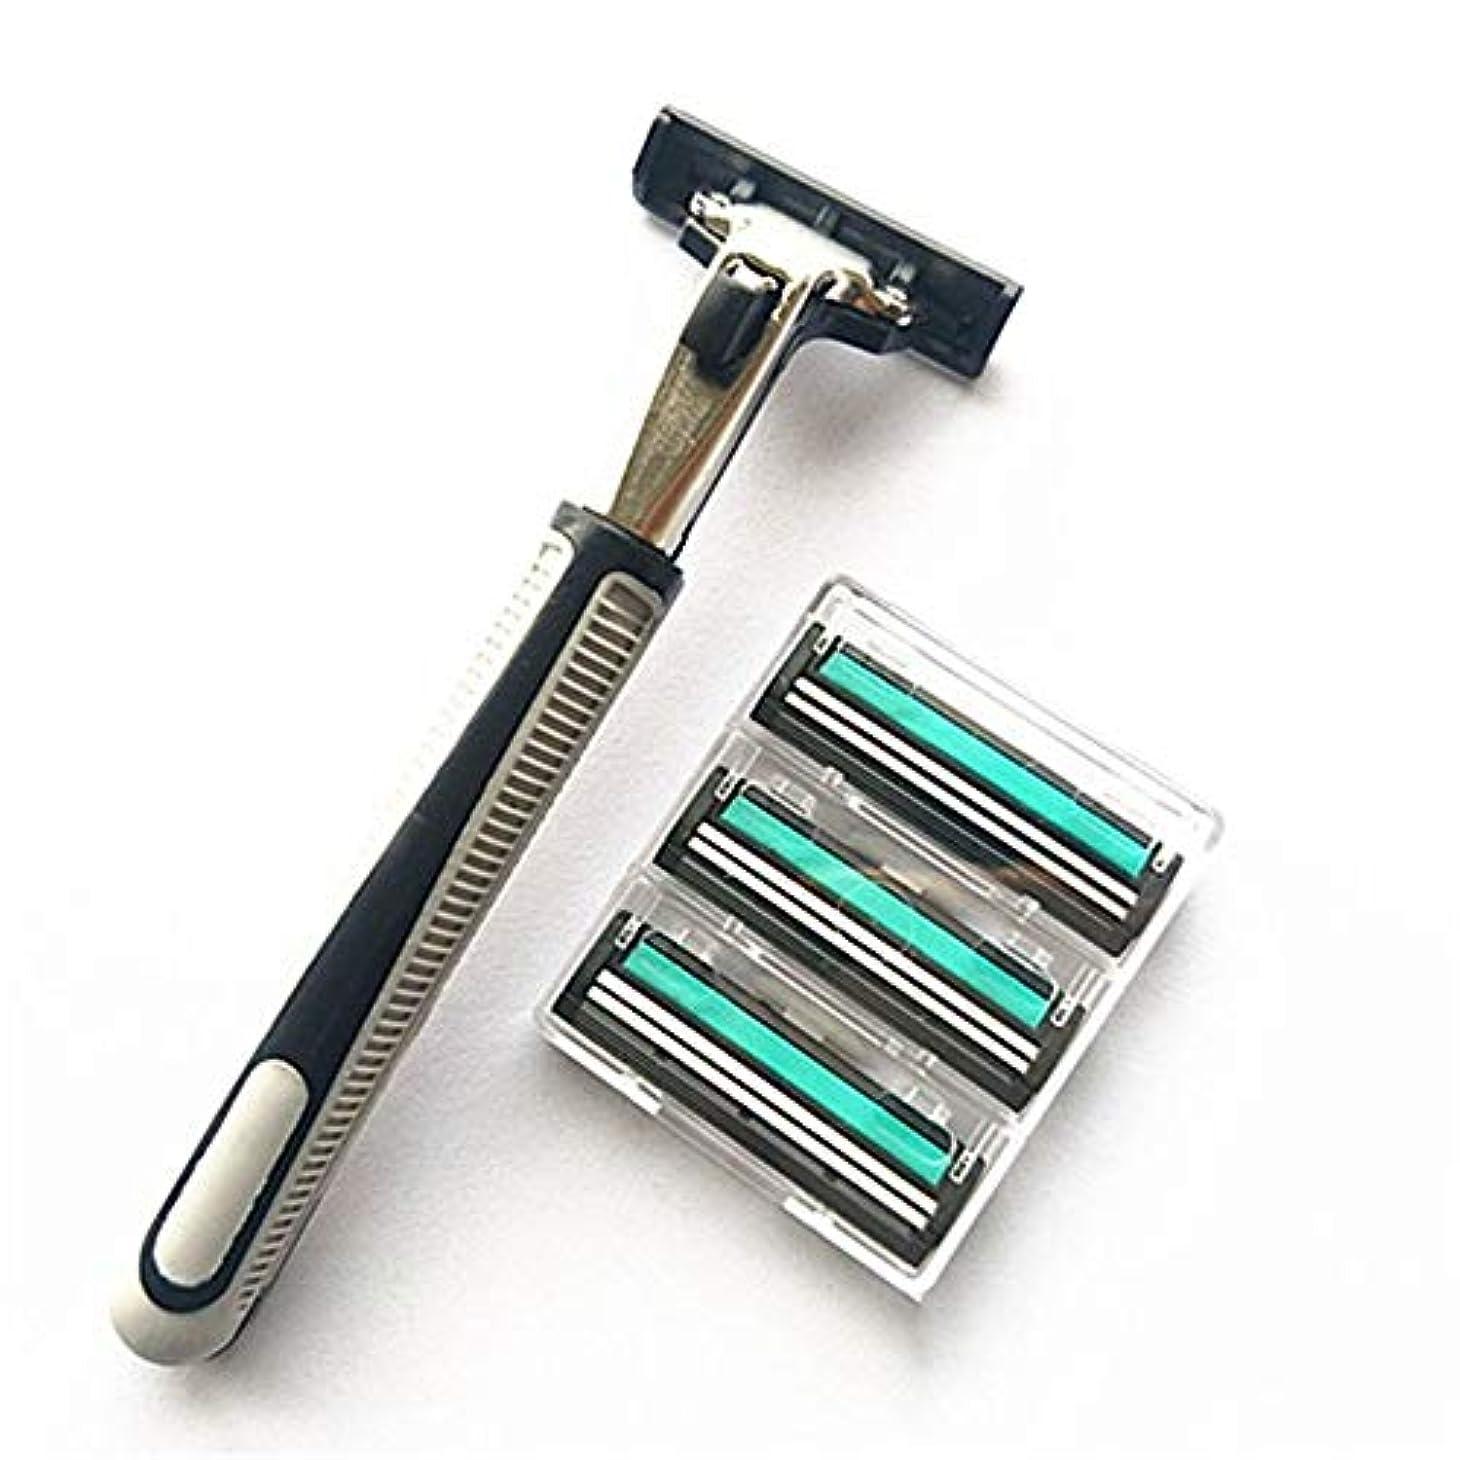 aomashangmao 新しい輸入ステンレス鋼ダブルかみそりの刃、12男性のかみそりの刃と1ピースマニュアルメンズストレートかみそり